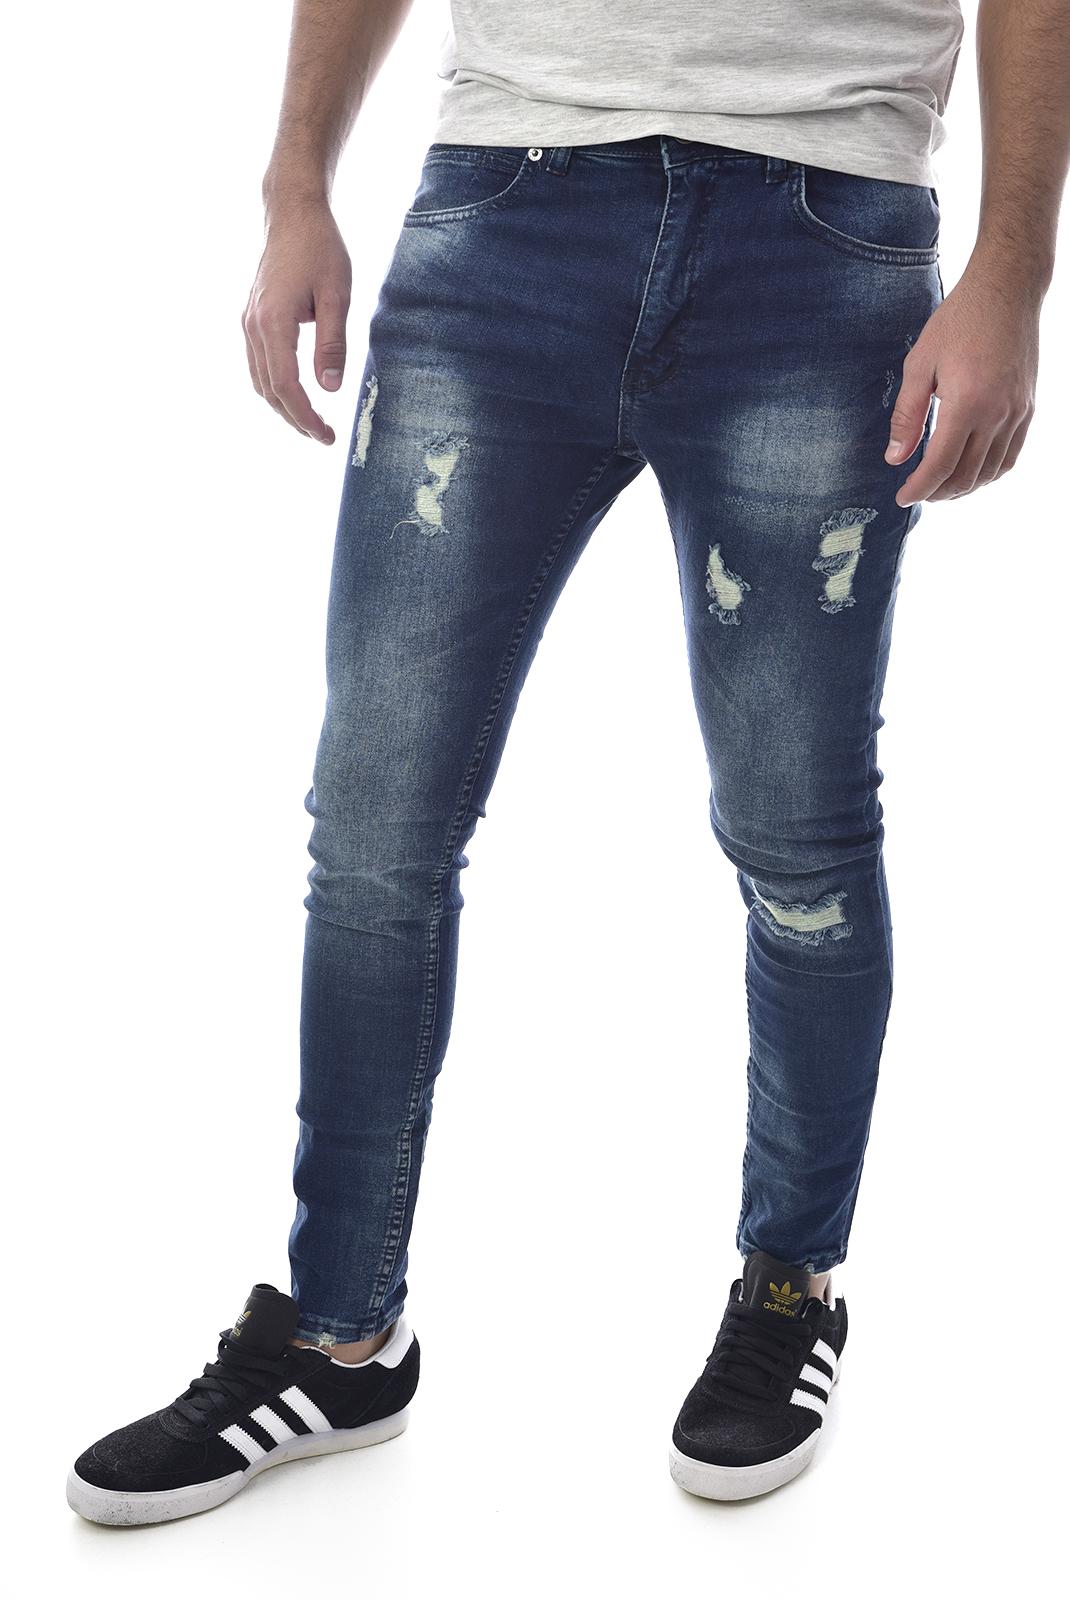 Jeans  Goldenim paris 1301 BLEU